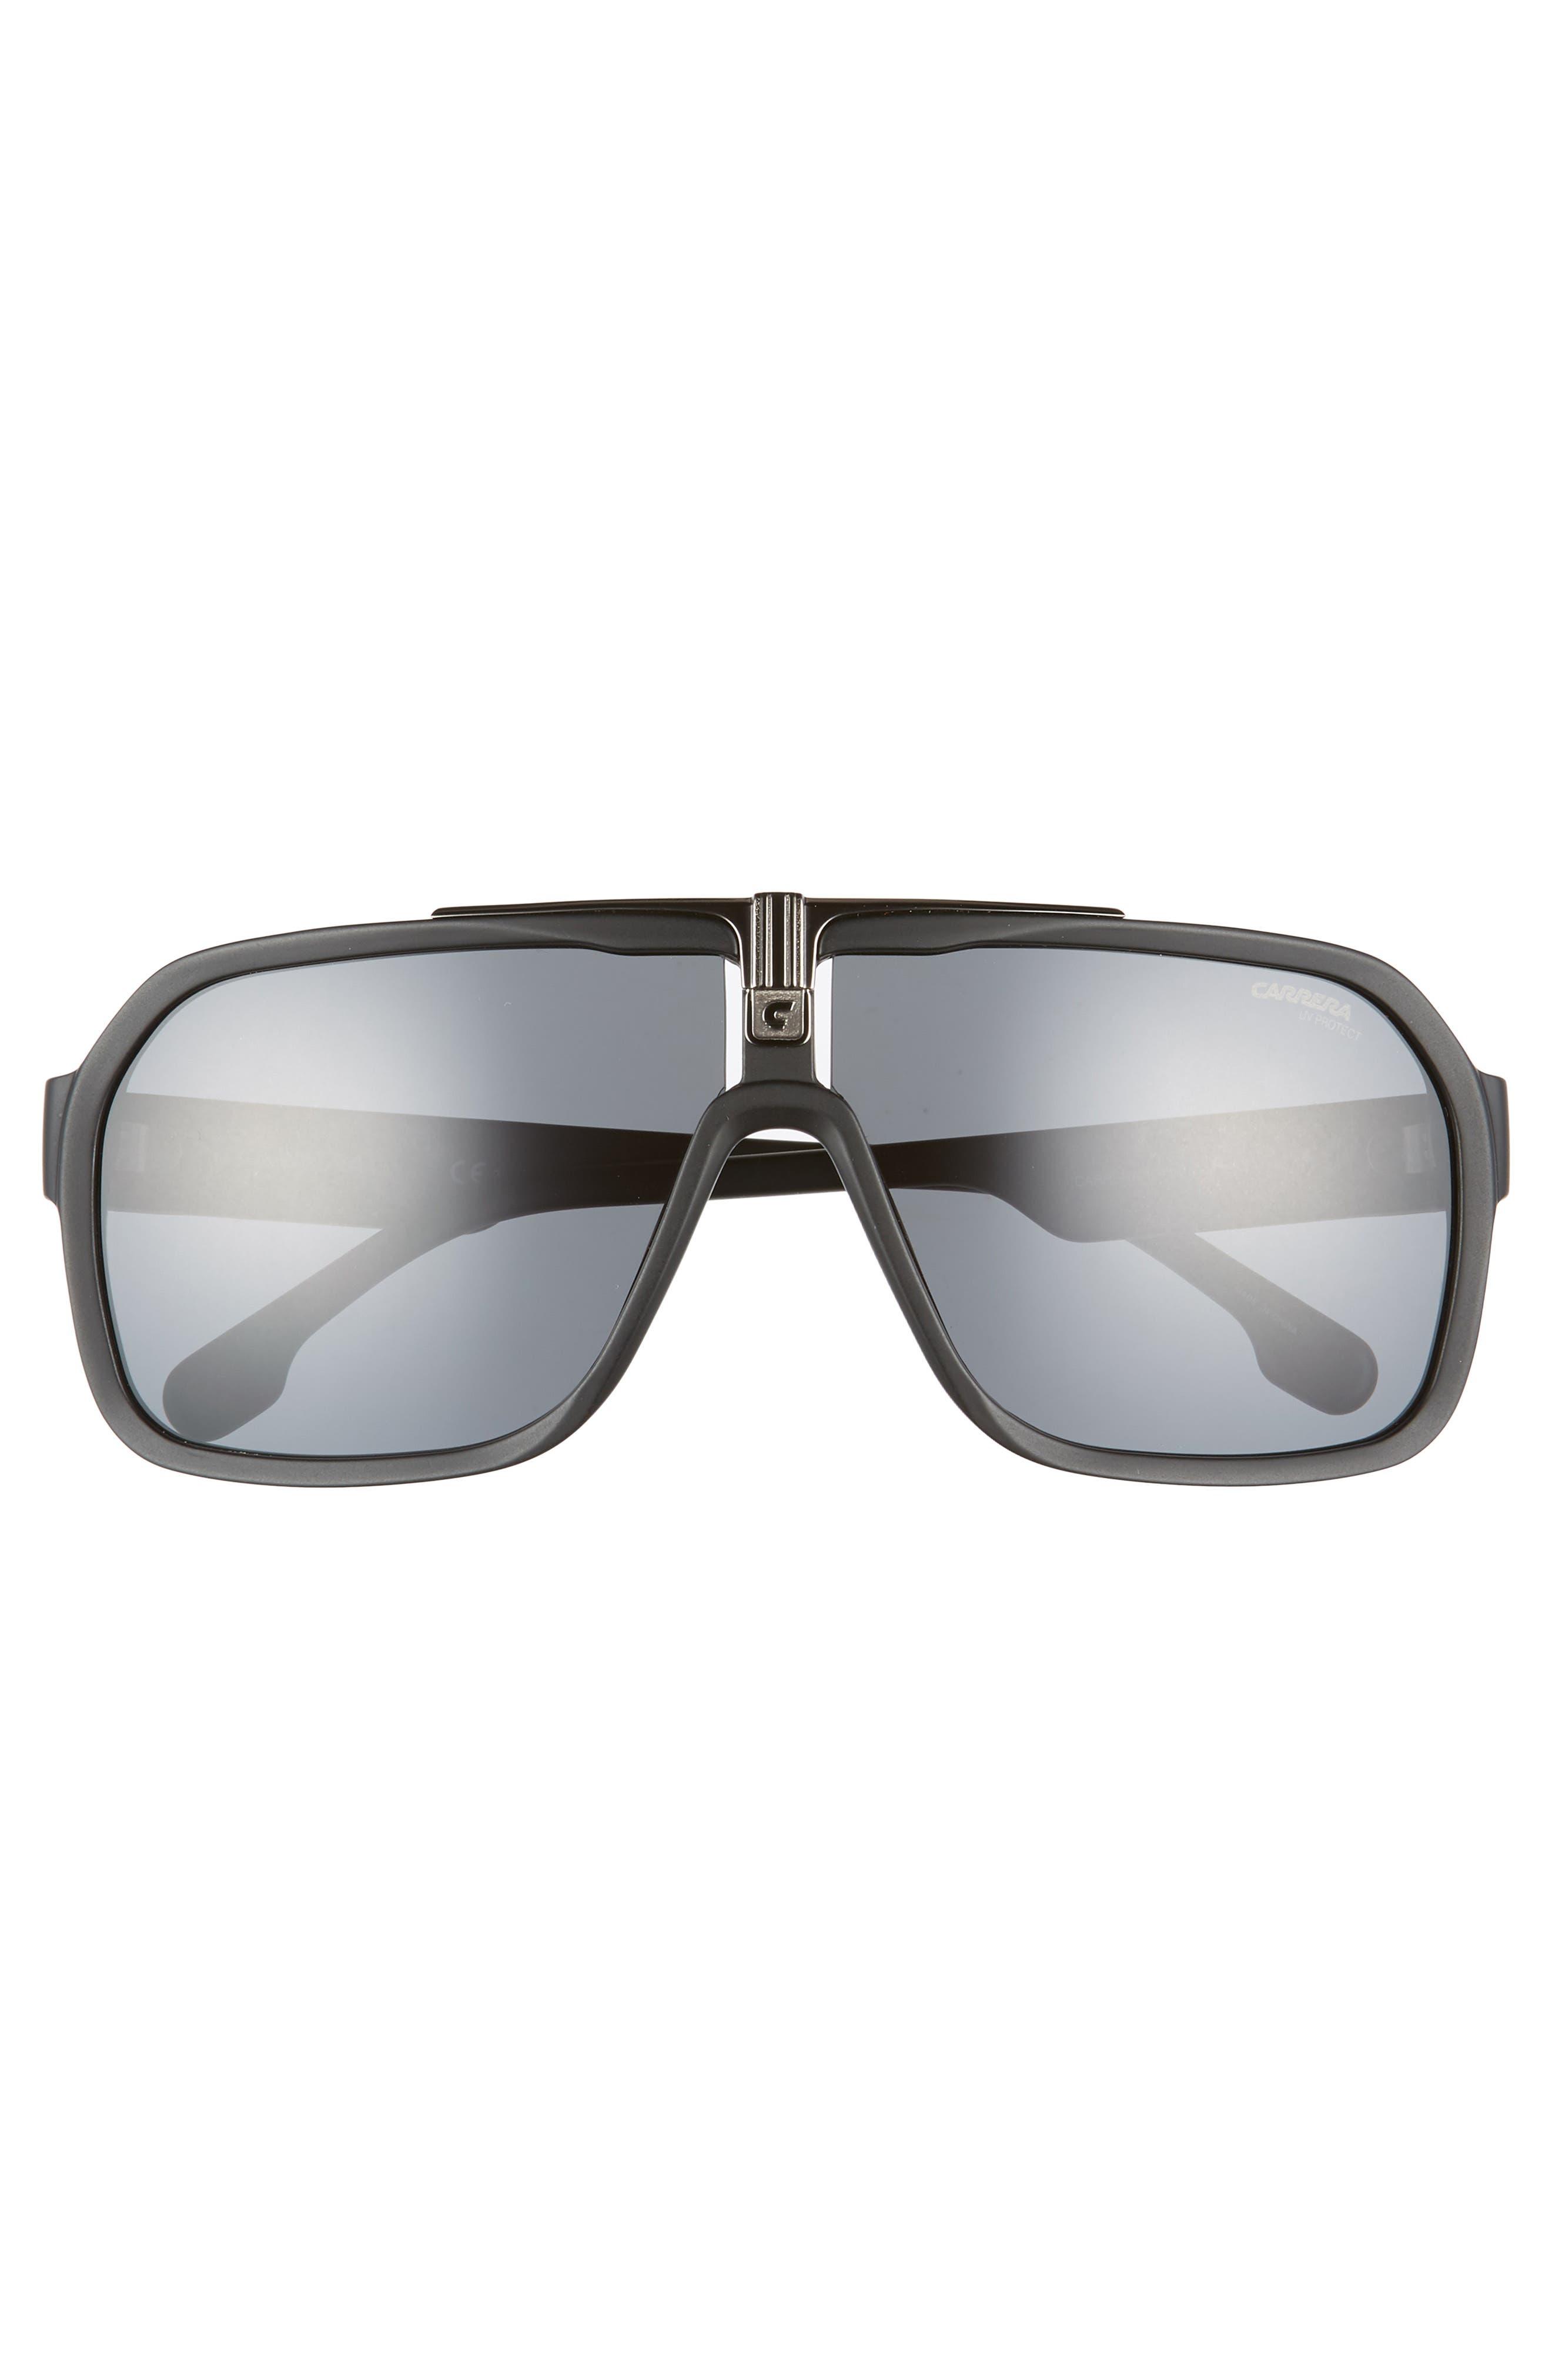 64mm Navigator Sunglasses,                             Alternate thumbnail 2, color,                             MATTE BLACK